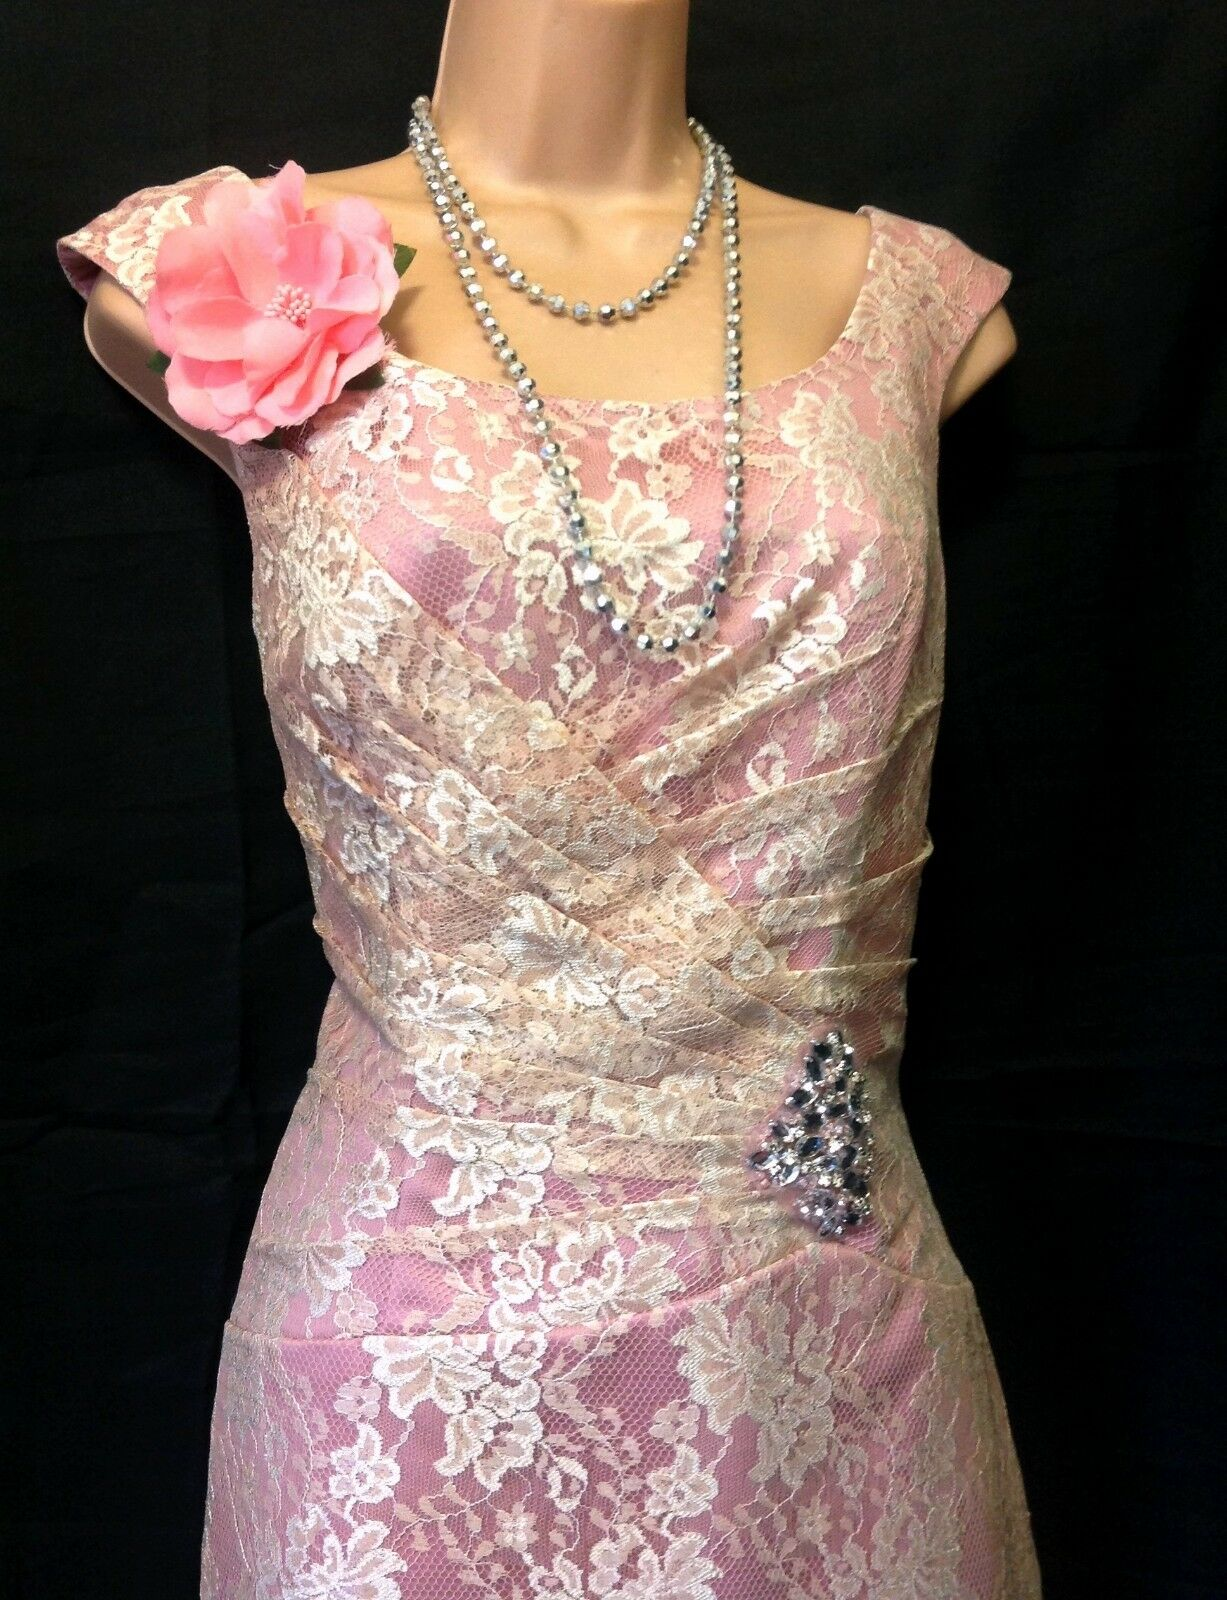 Bnwt EBONY ROSE (UK 12) Peach Lace & Pink Satin Cocktail Dress /Weddings/Races